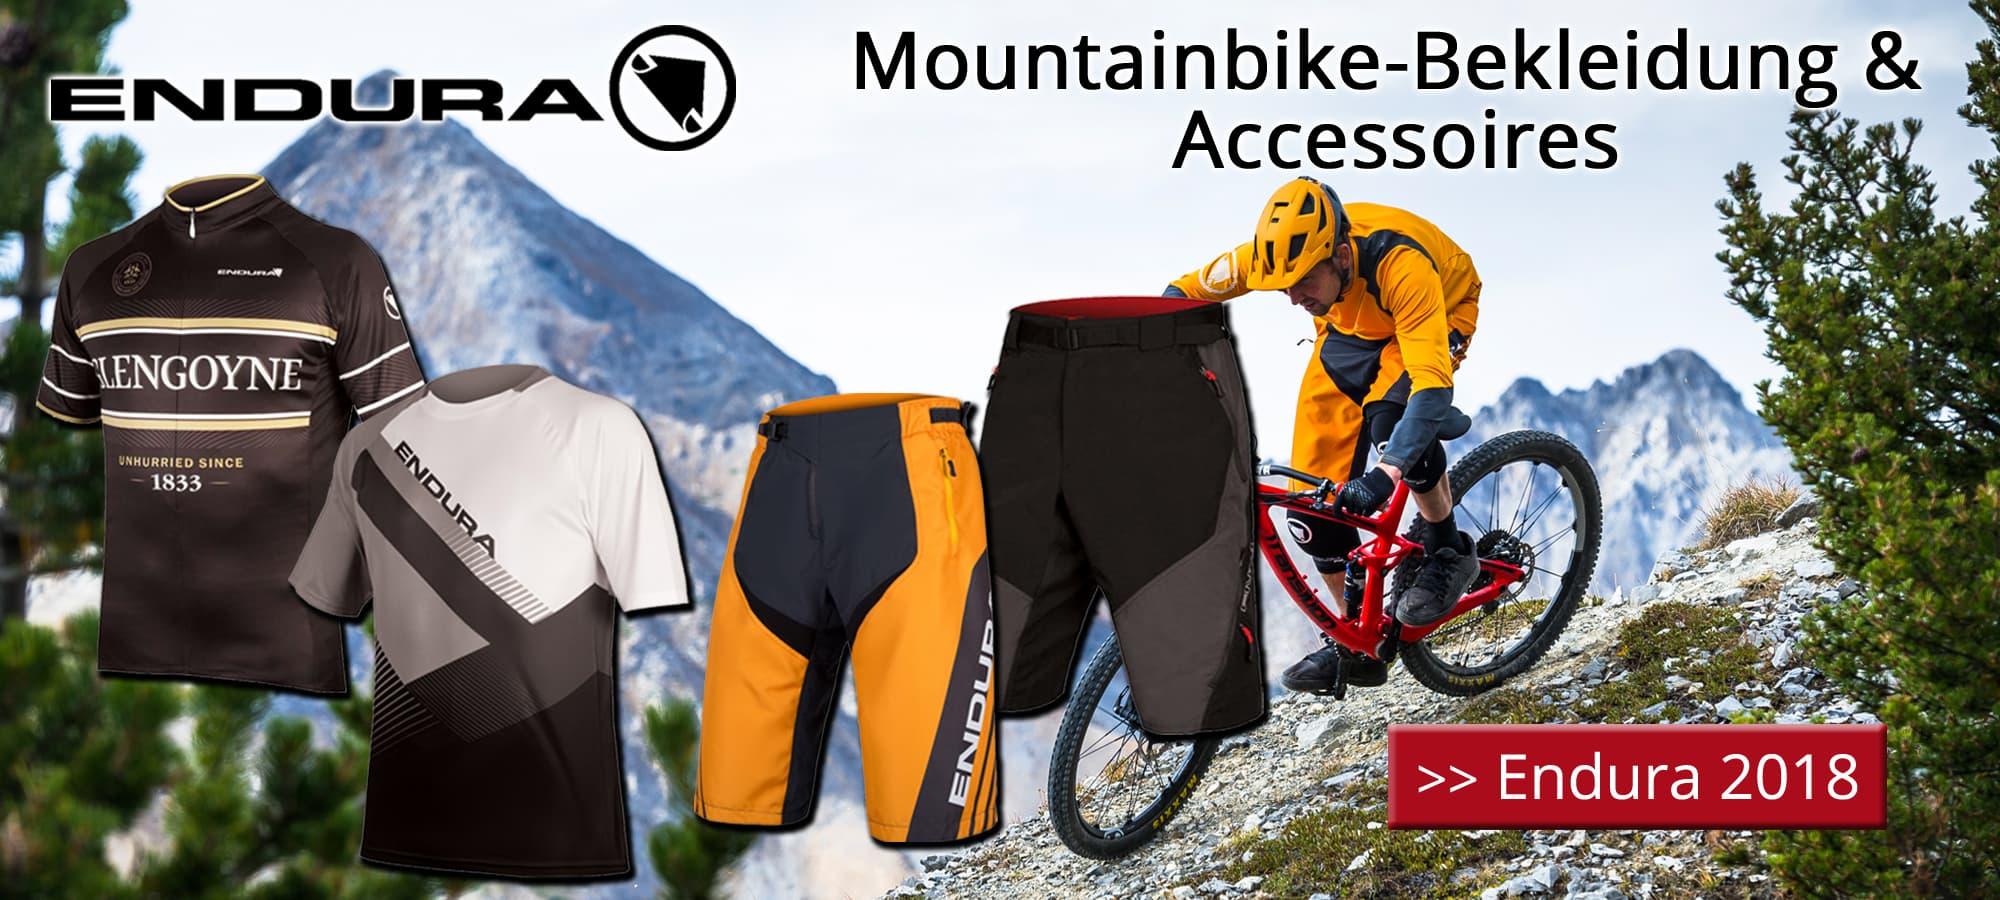 Endura 2018 - Mountainbike-Bekleidung & Accessoires